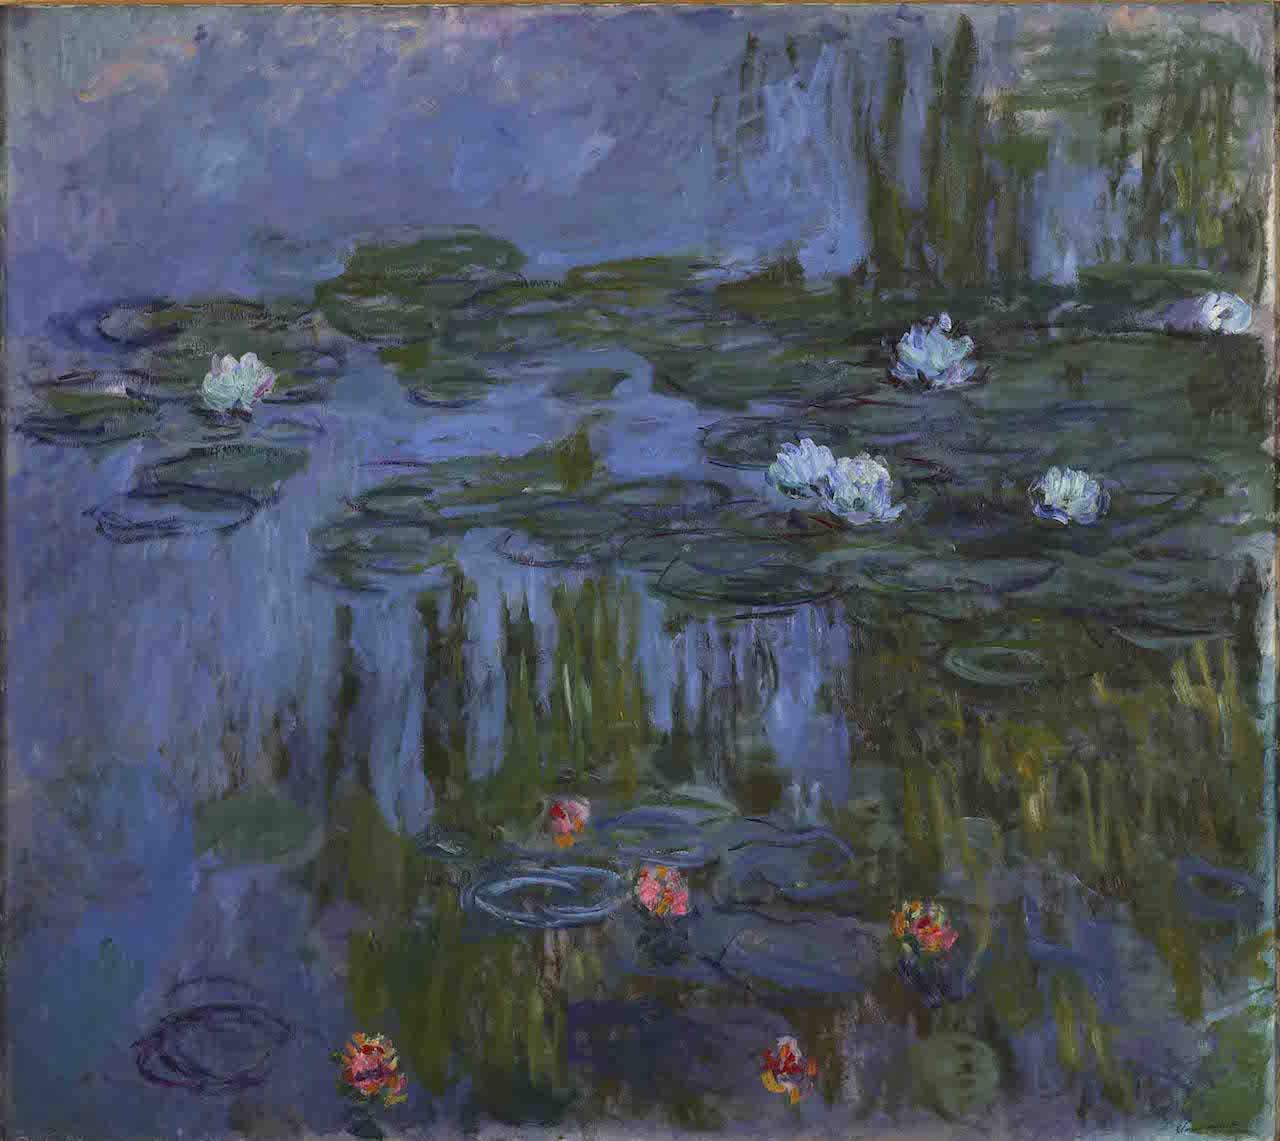 Claude Monet, Nympheas (Waterlilies), 1914-15 Oil on canvas, 160.7 x 180.3 cm Portland Art Museum, Oregon. Museum Purchase: Helen Thurston Ayer Fund, 59.16 Photo (c) Portland Art Museum, Portland, Oregon